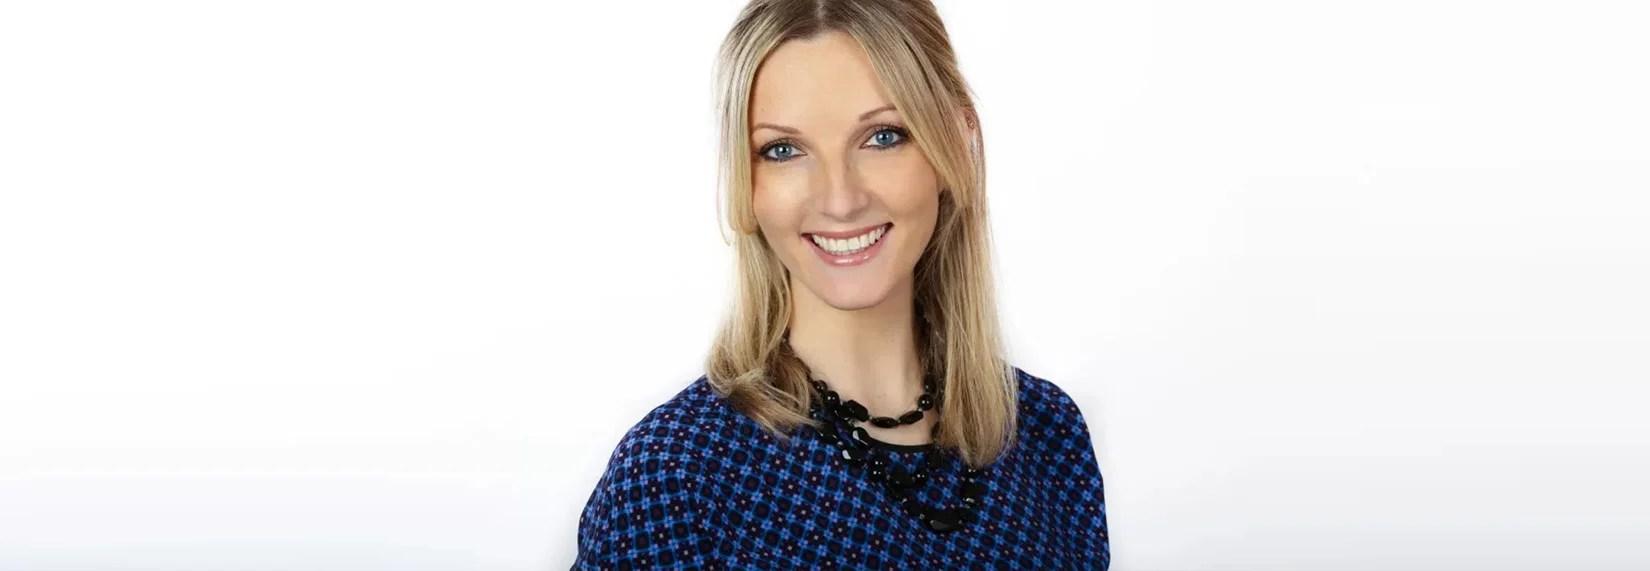 In Conversation with Rachel MacLynn, The Vida Consultancy